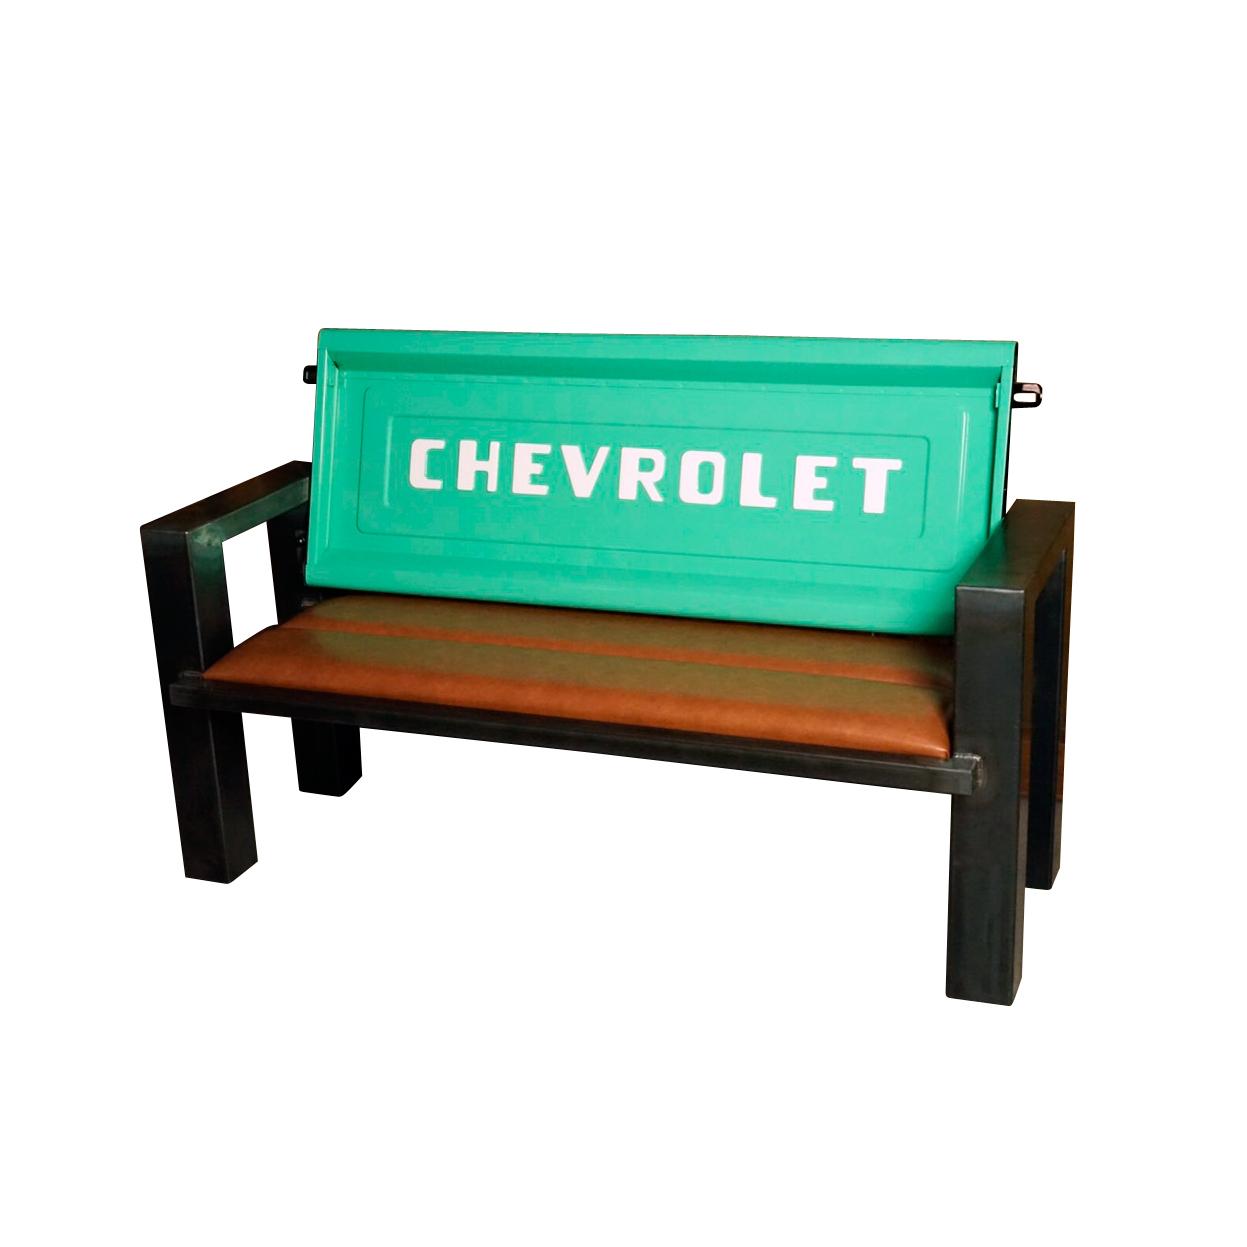 M-LINE CHEVROLET TAILGATE BENCH 【クッション】テールゲートベンチ